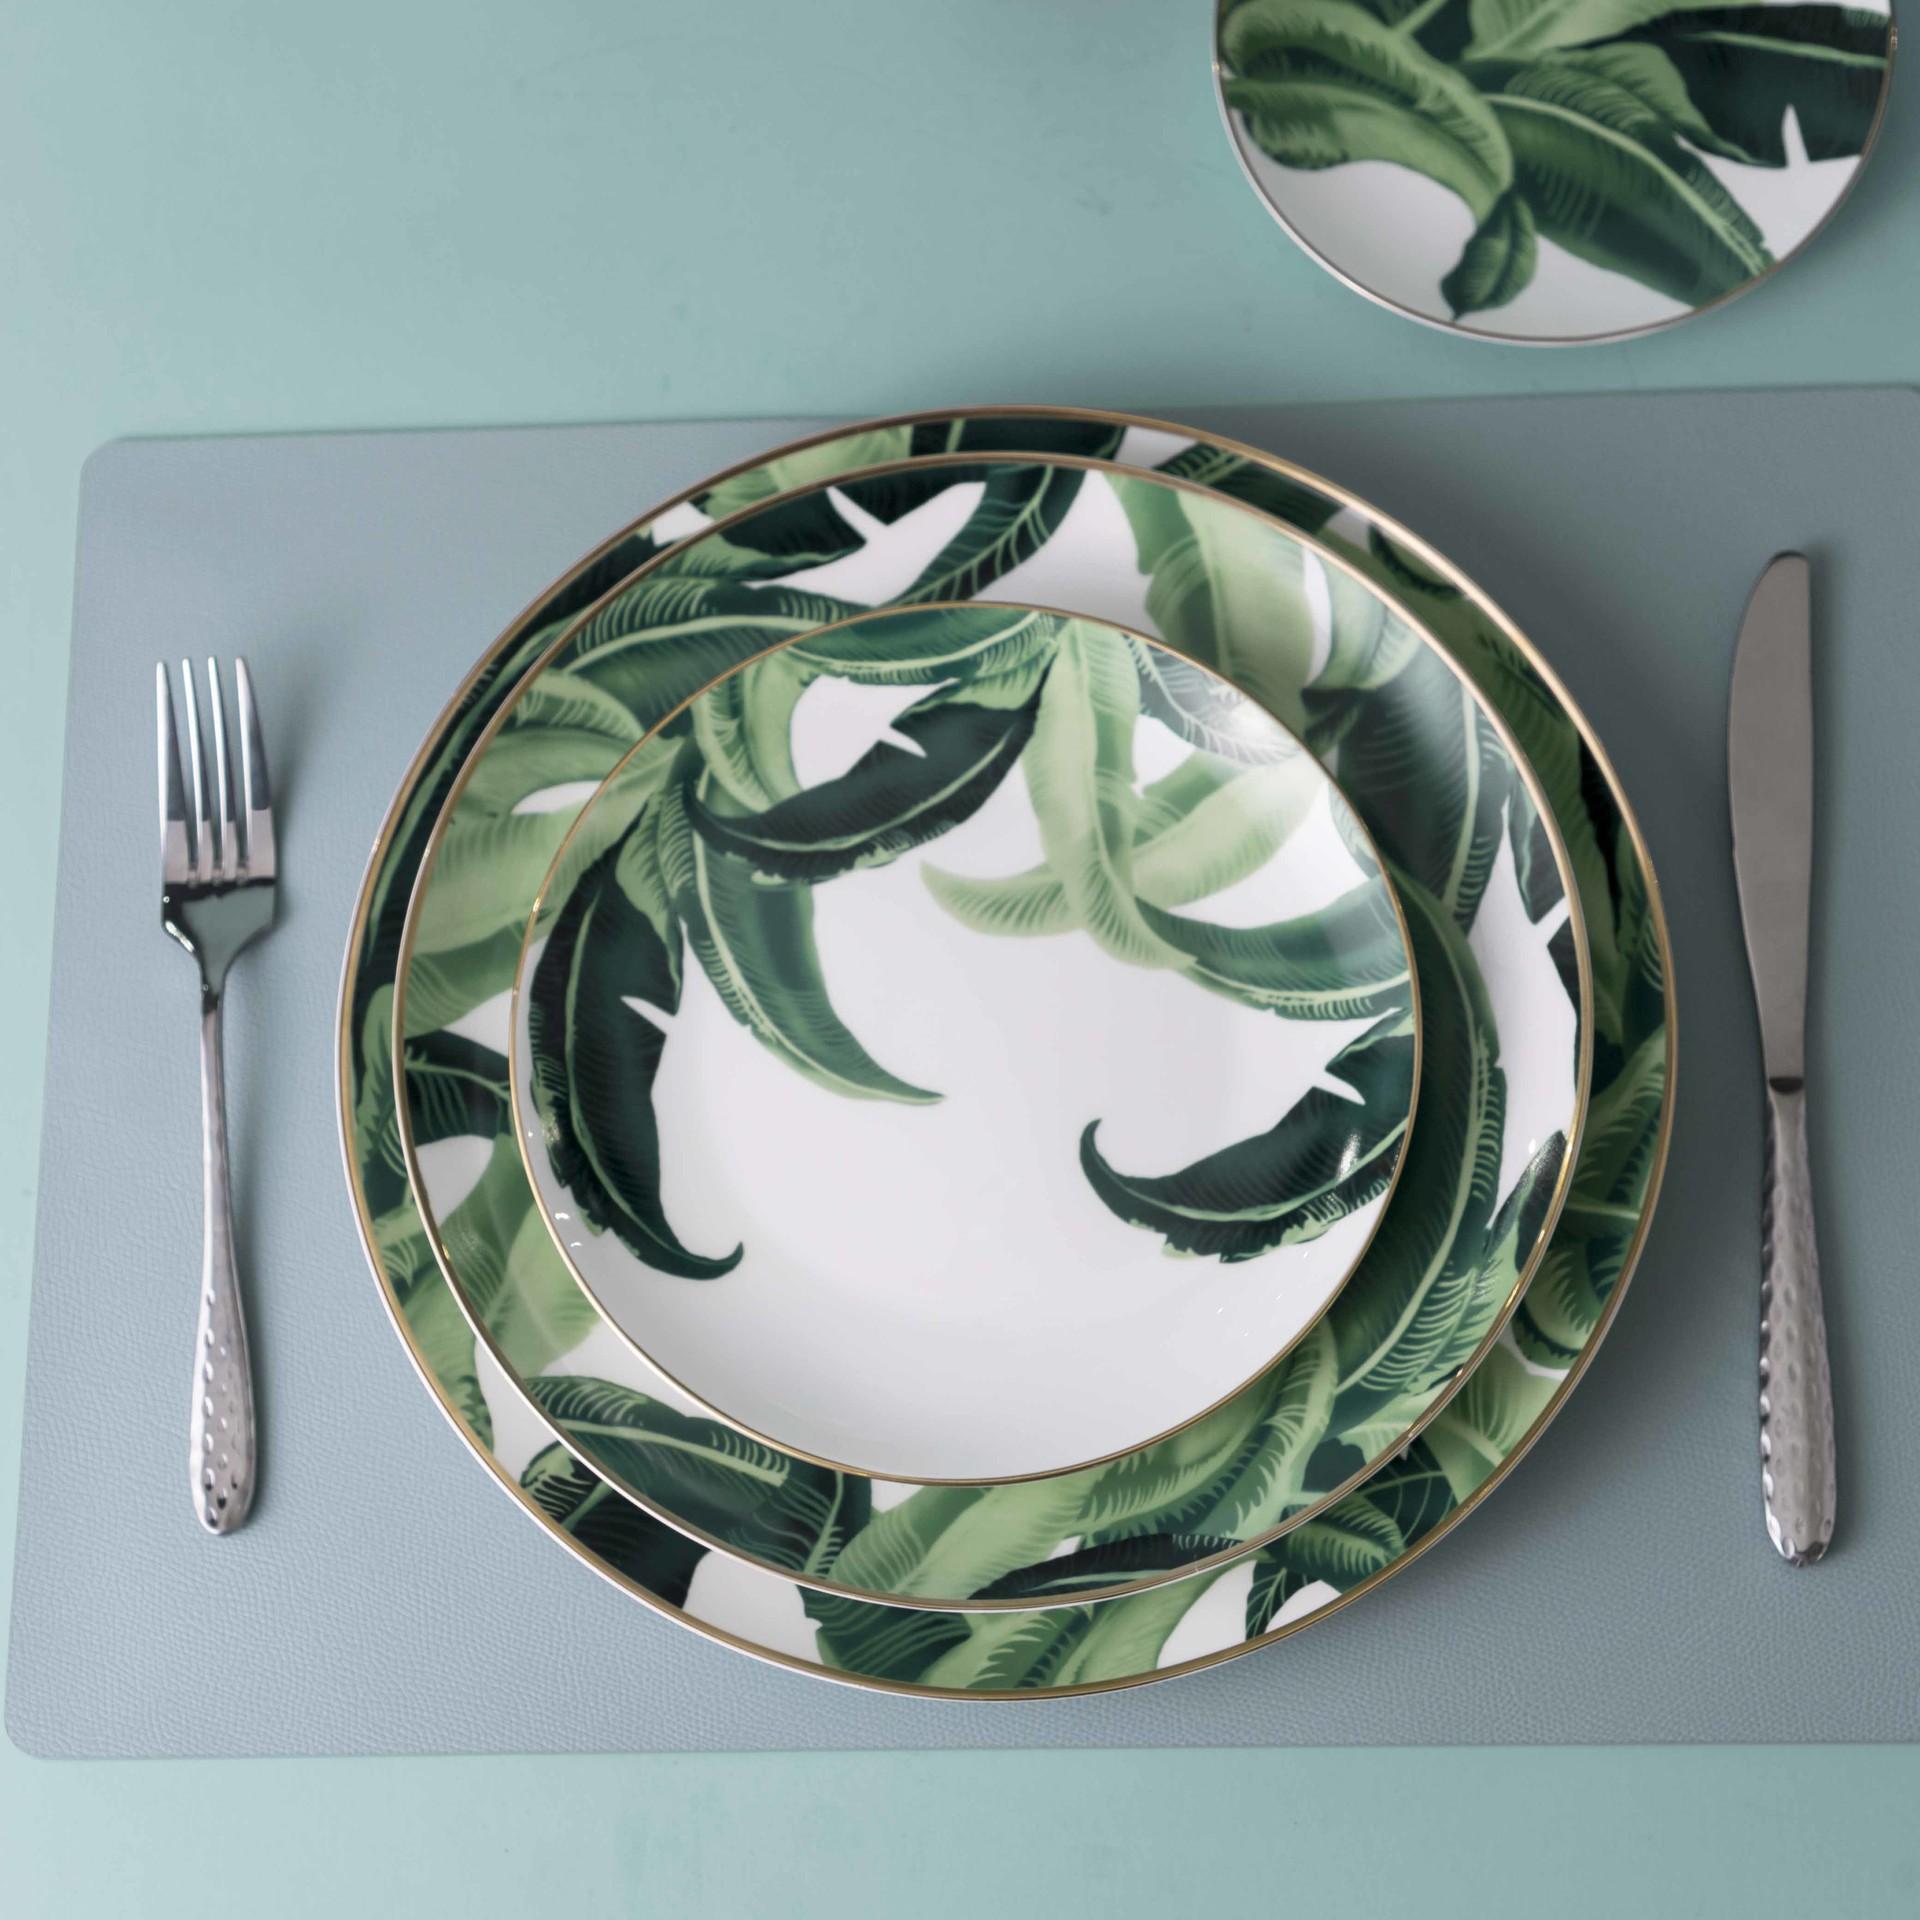 New Design Products Luxury Restaurants Decal Bone China Dinner Plate, Hotel Tableware Supplierd^